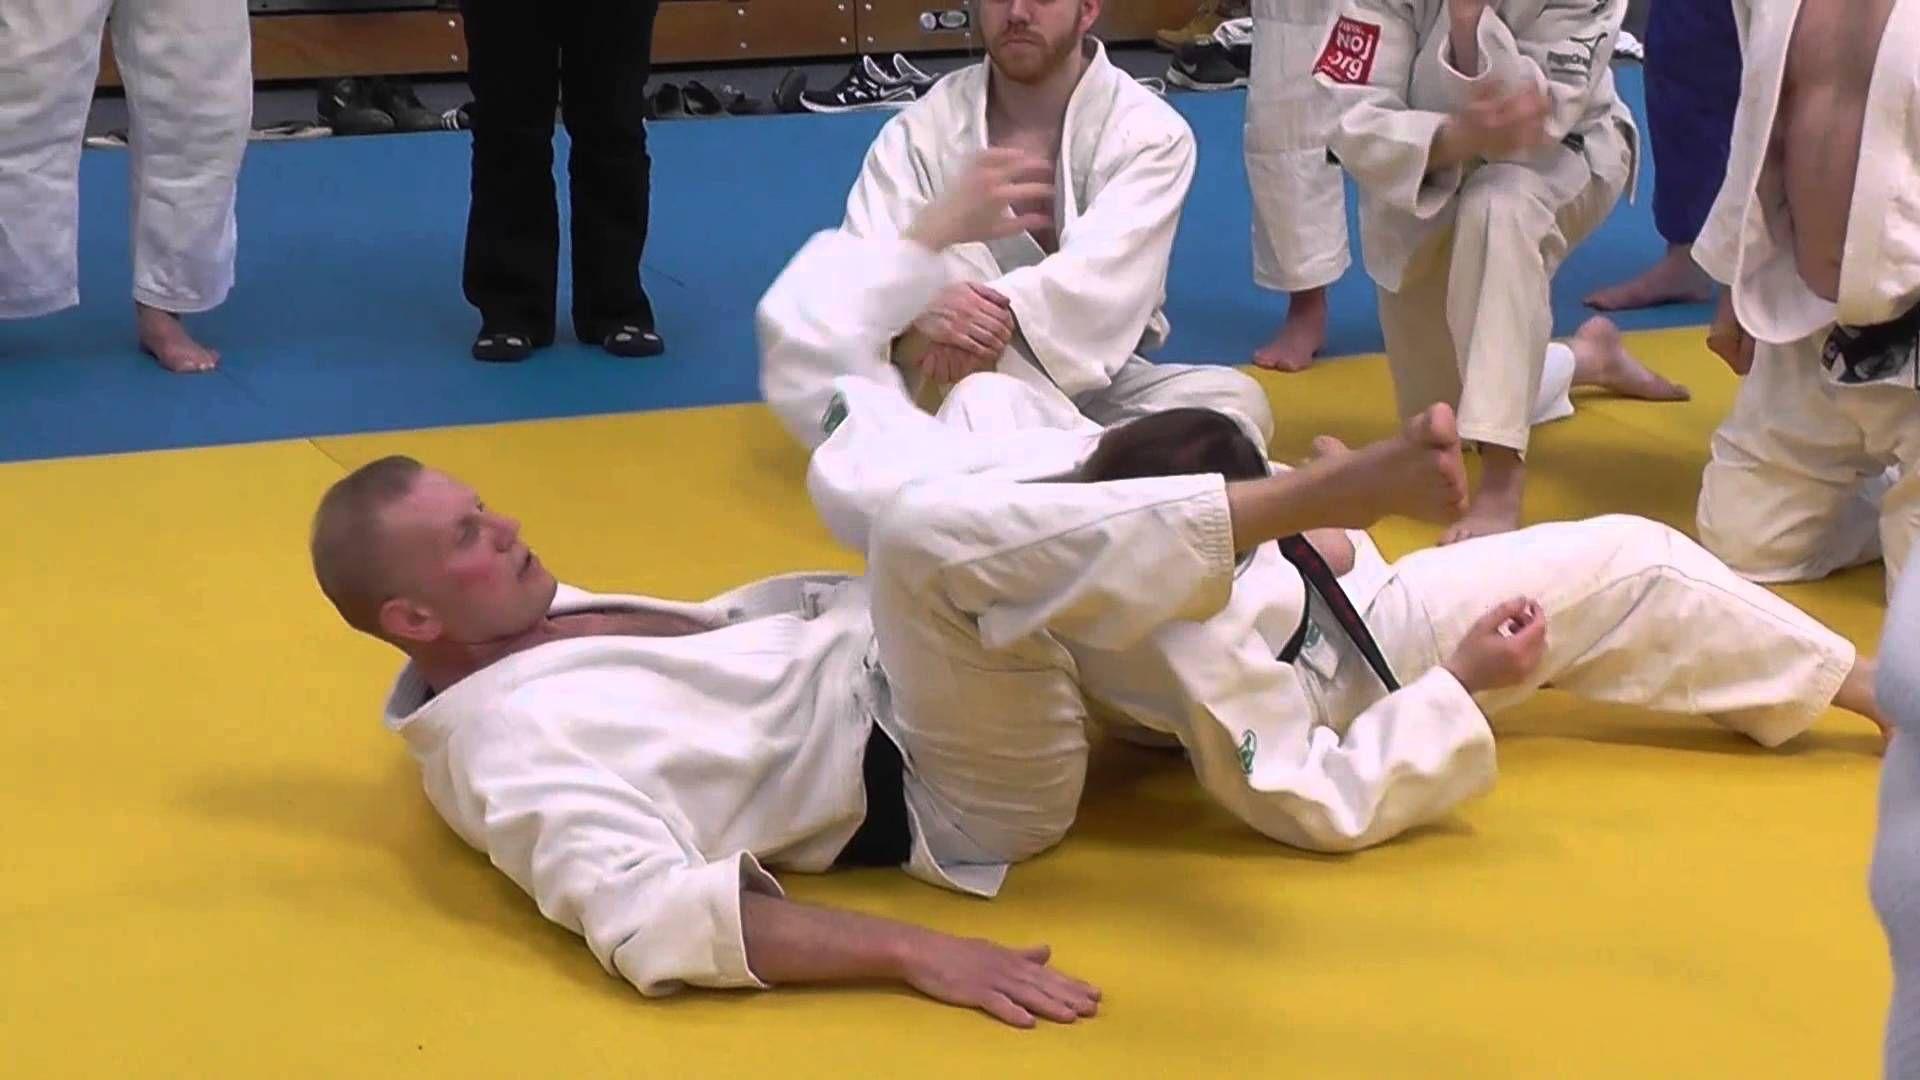 Judo jujigatame part 2 steve gawthorpe series 2 judo